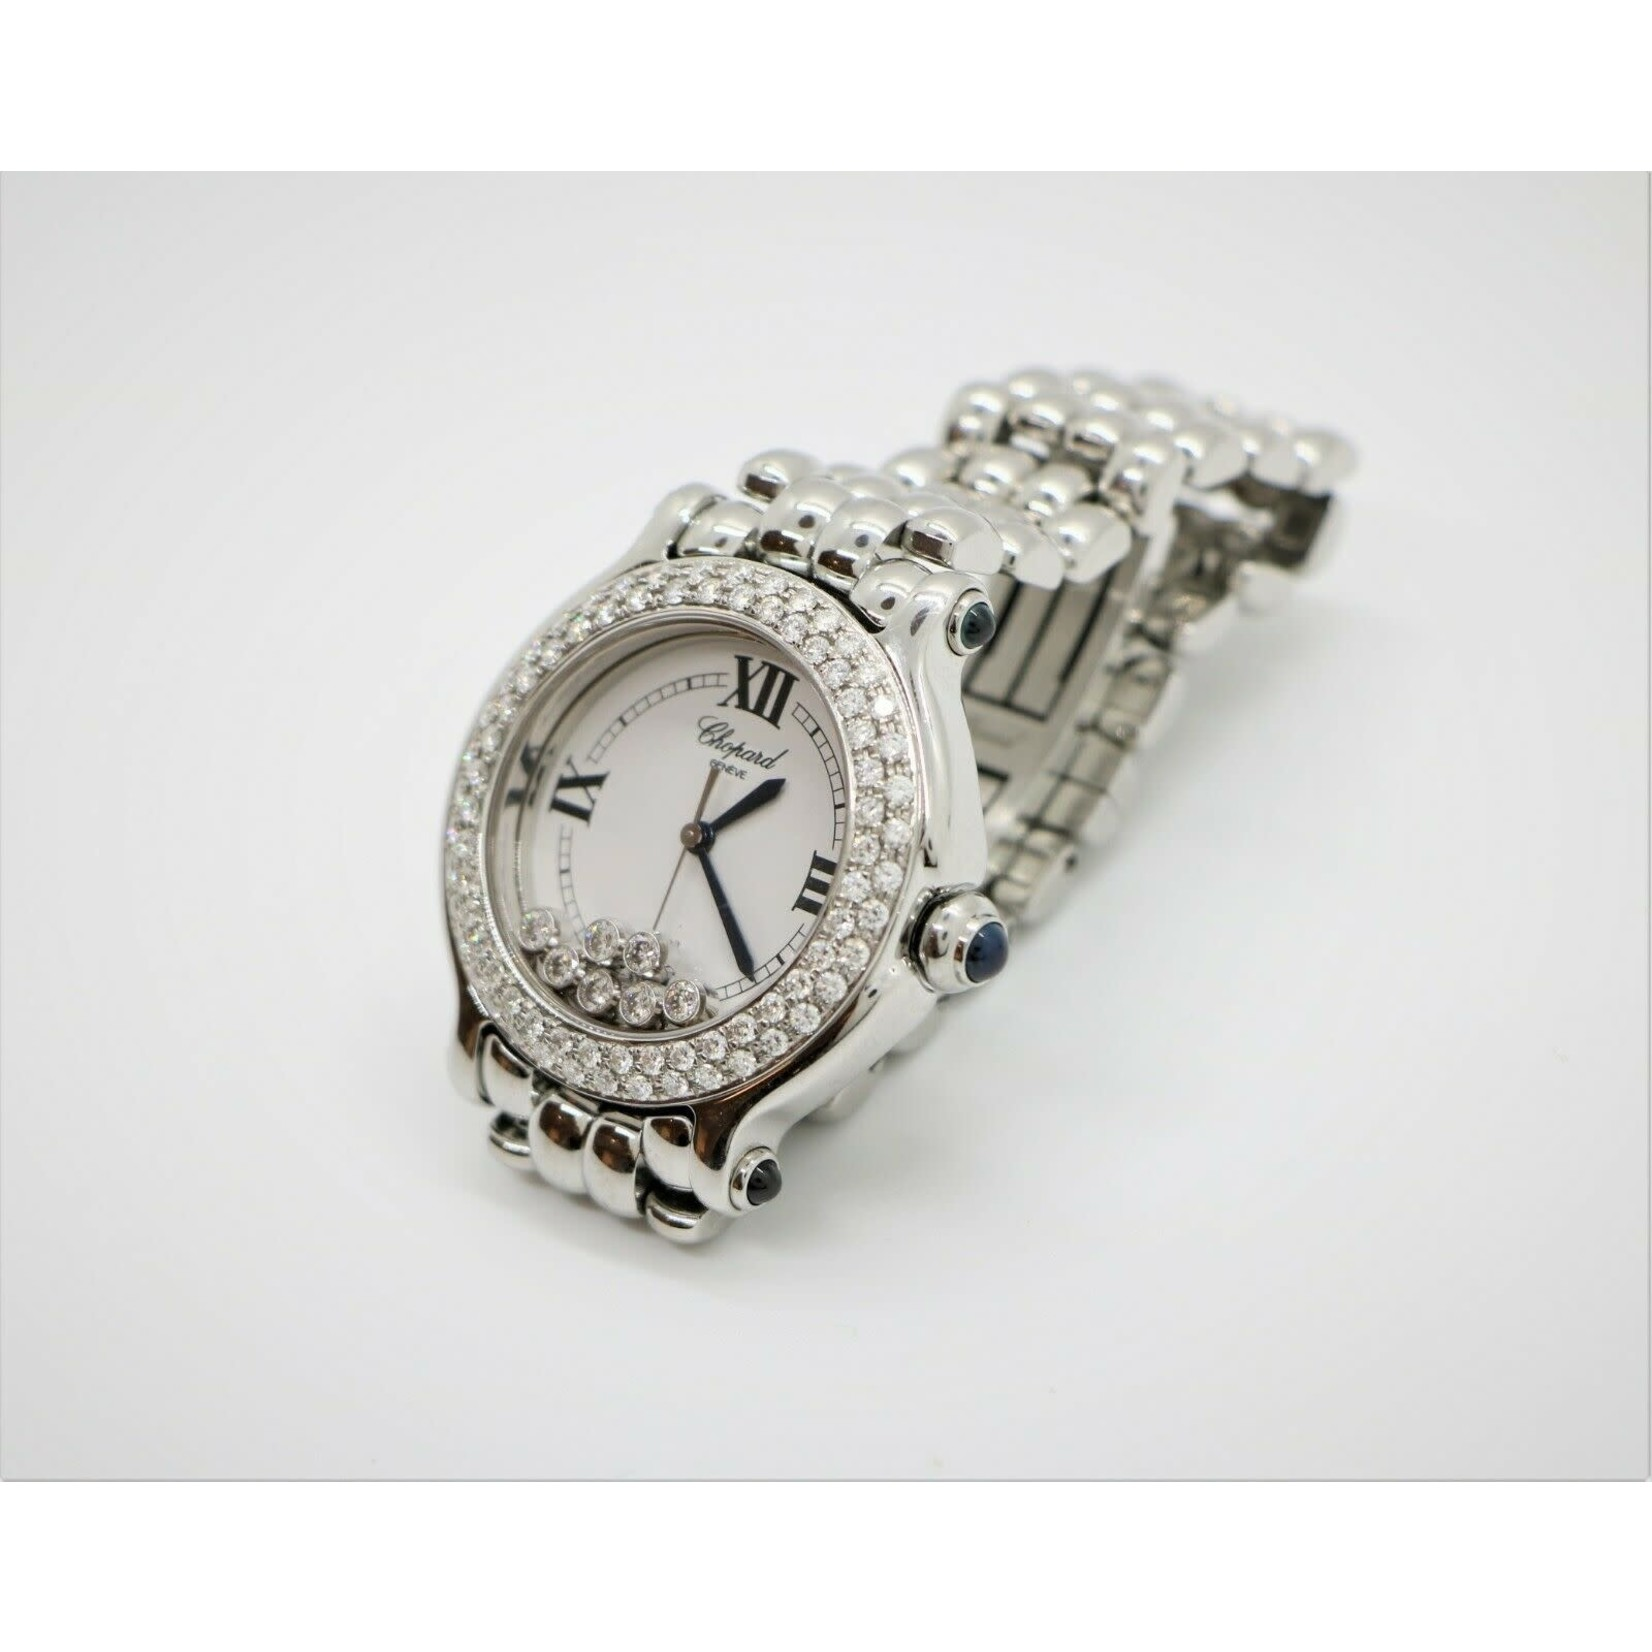 Wyld Blue Vintage Chopard White Gold Diamond Watch